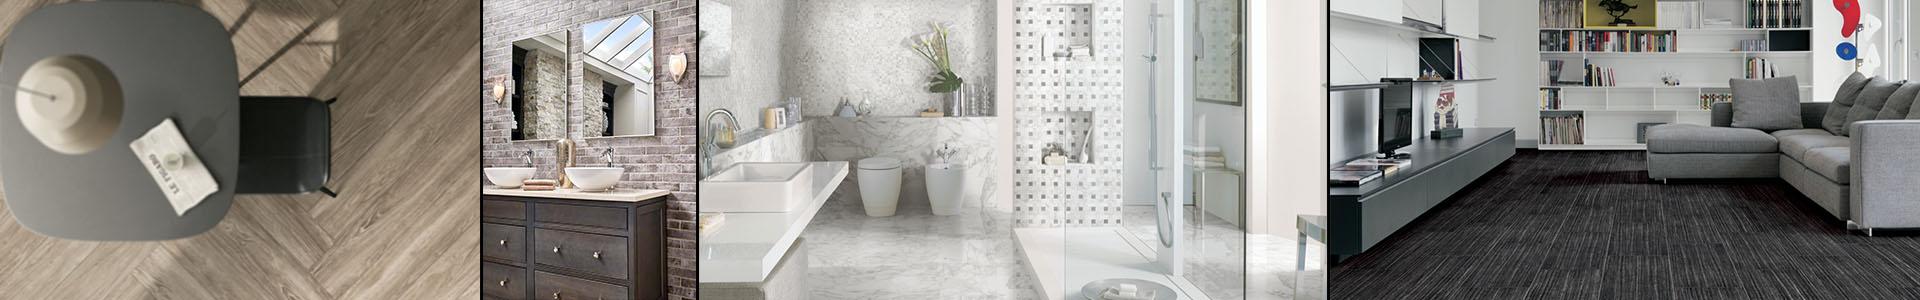 Porcelain-Tile-Raleigh-Boutique-Kitchen-Bathroom-Counter-FLoor